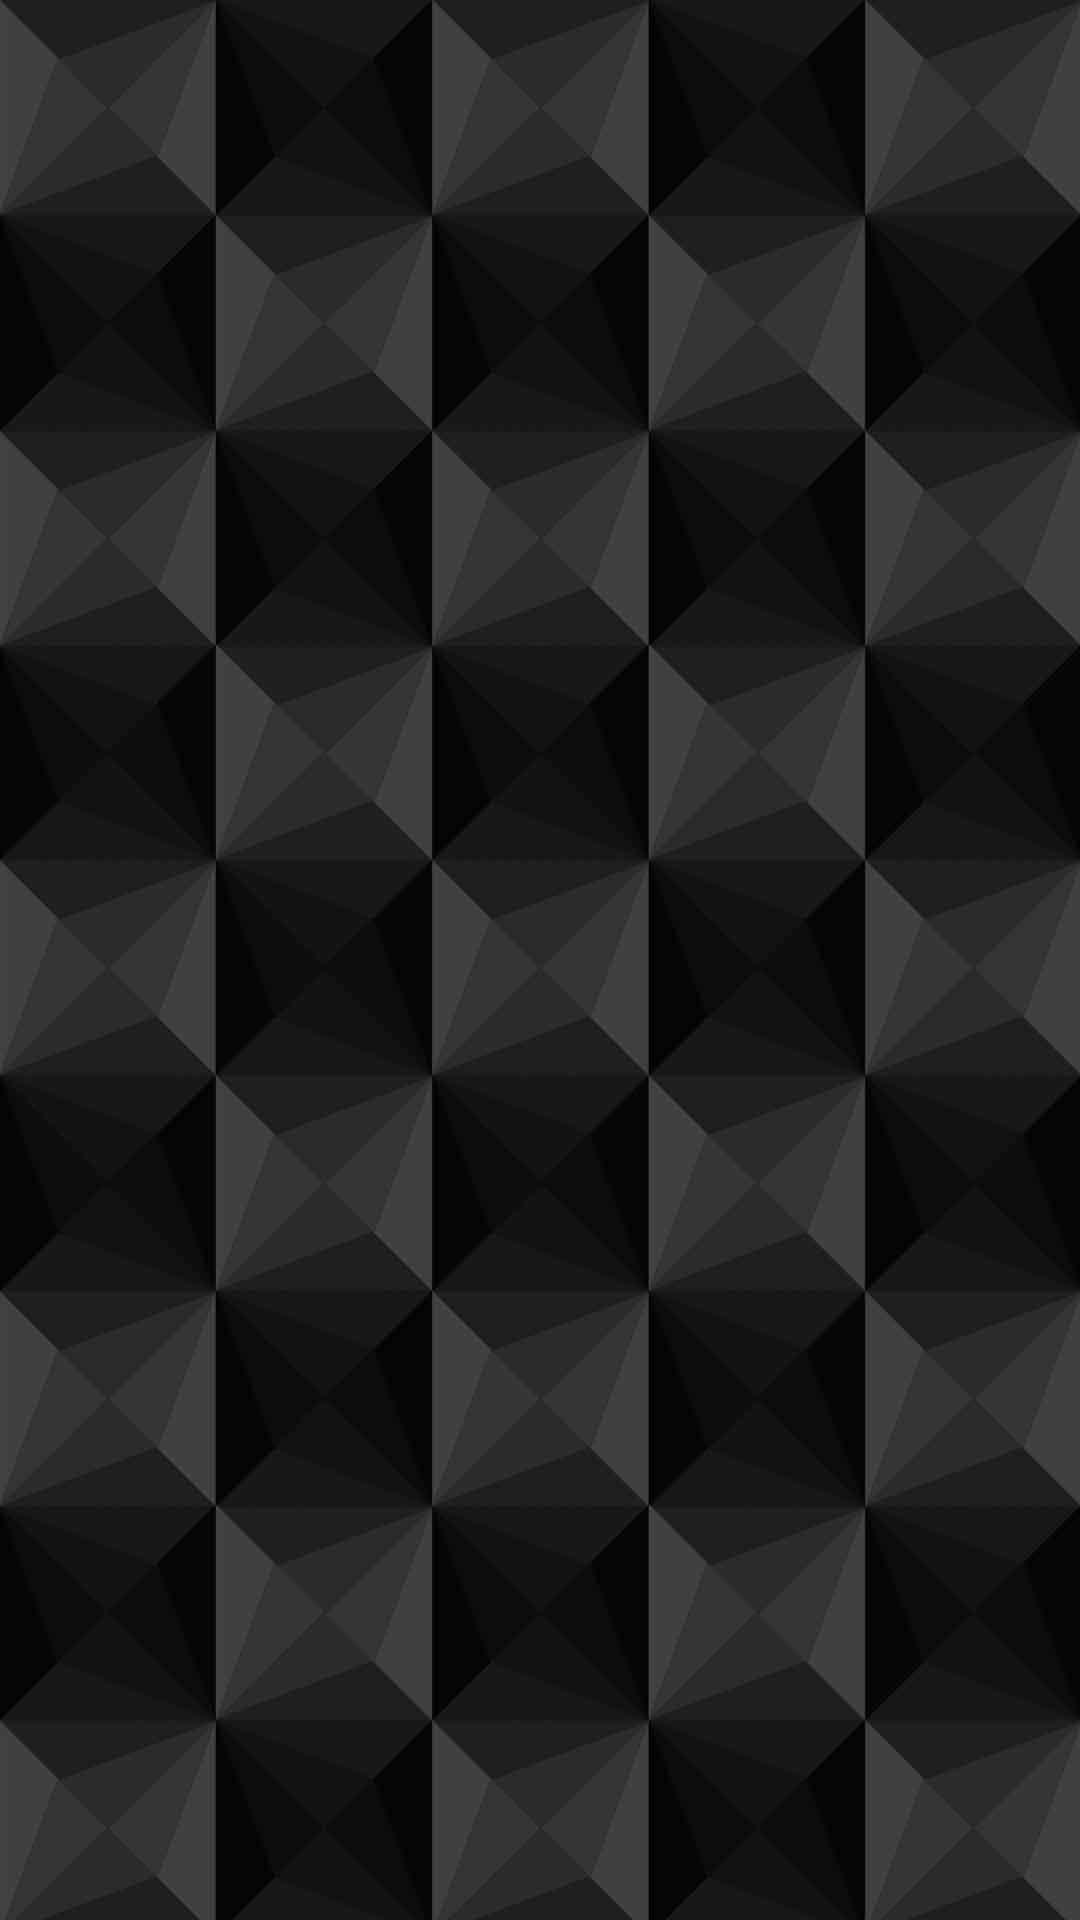 black style wallpaper